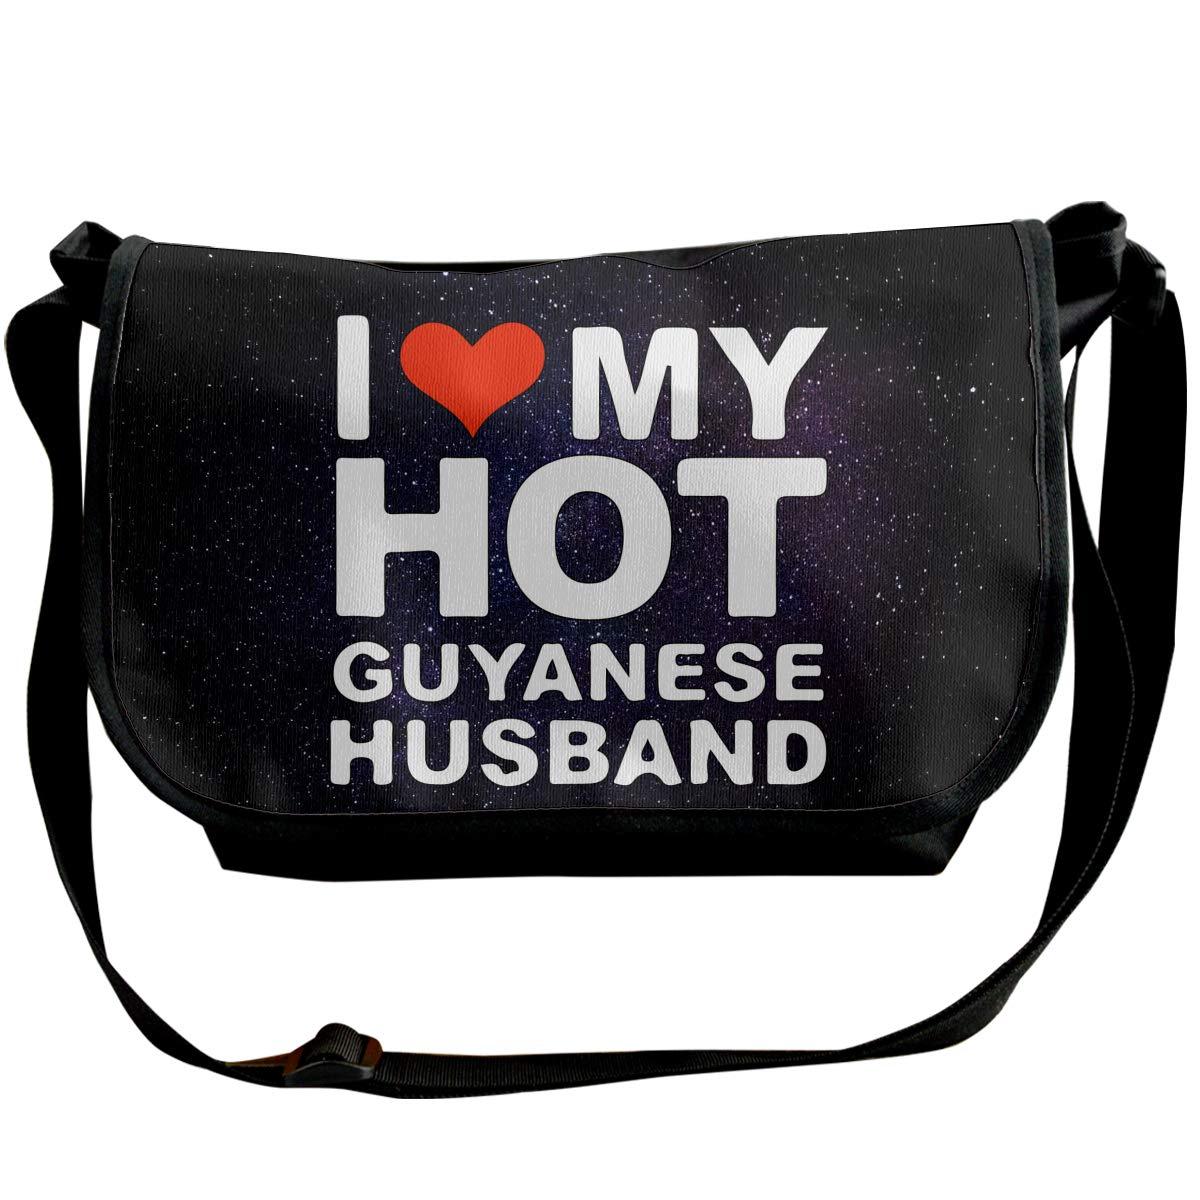 I LOVE MY HOT Guyanese Husband Unisex Sling Shoulder Bag Personalized Travel Bag